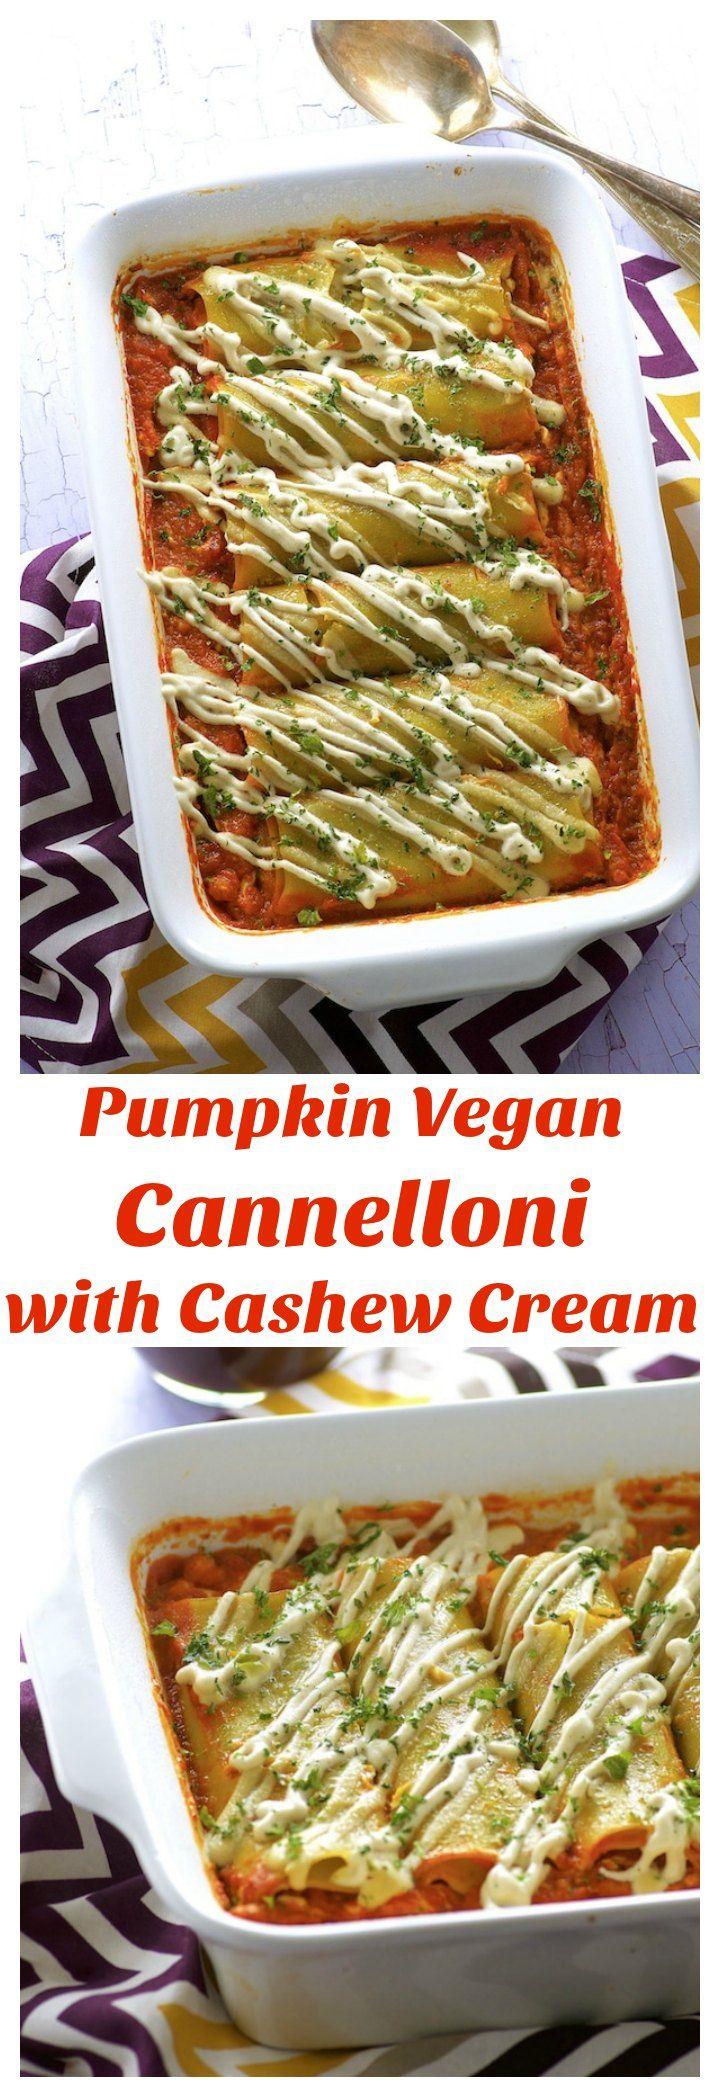 These Pumpkin Vegan Cannelloni with Cashew Cream m…